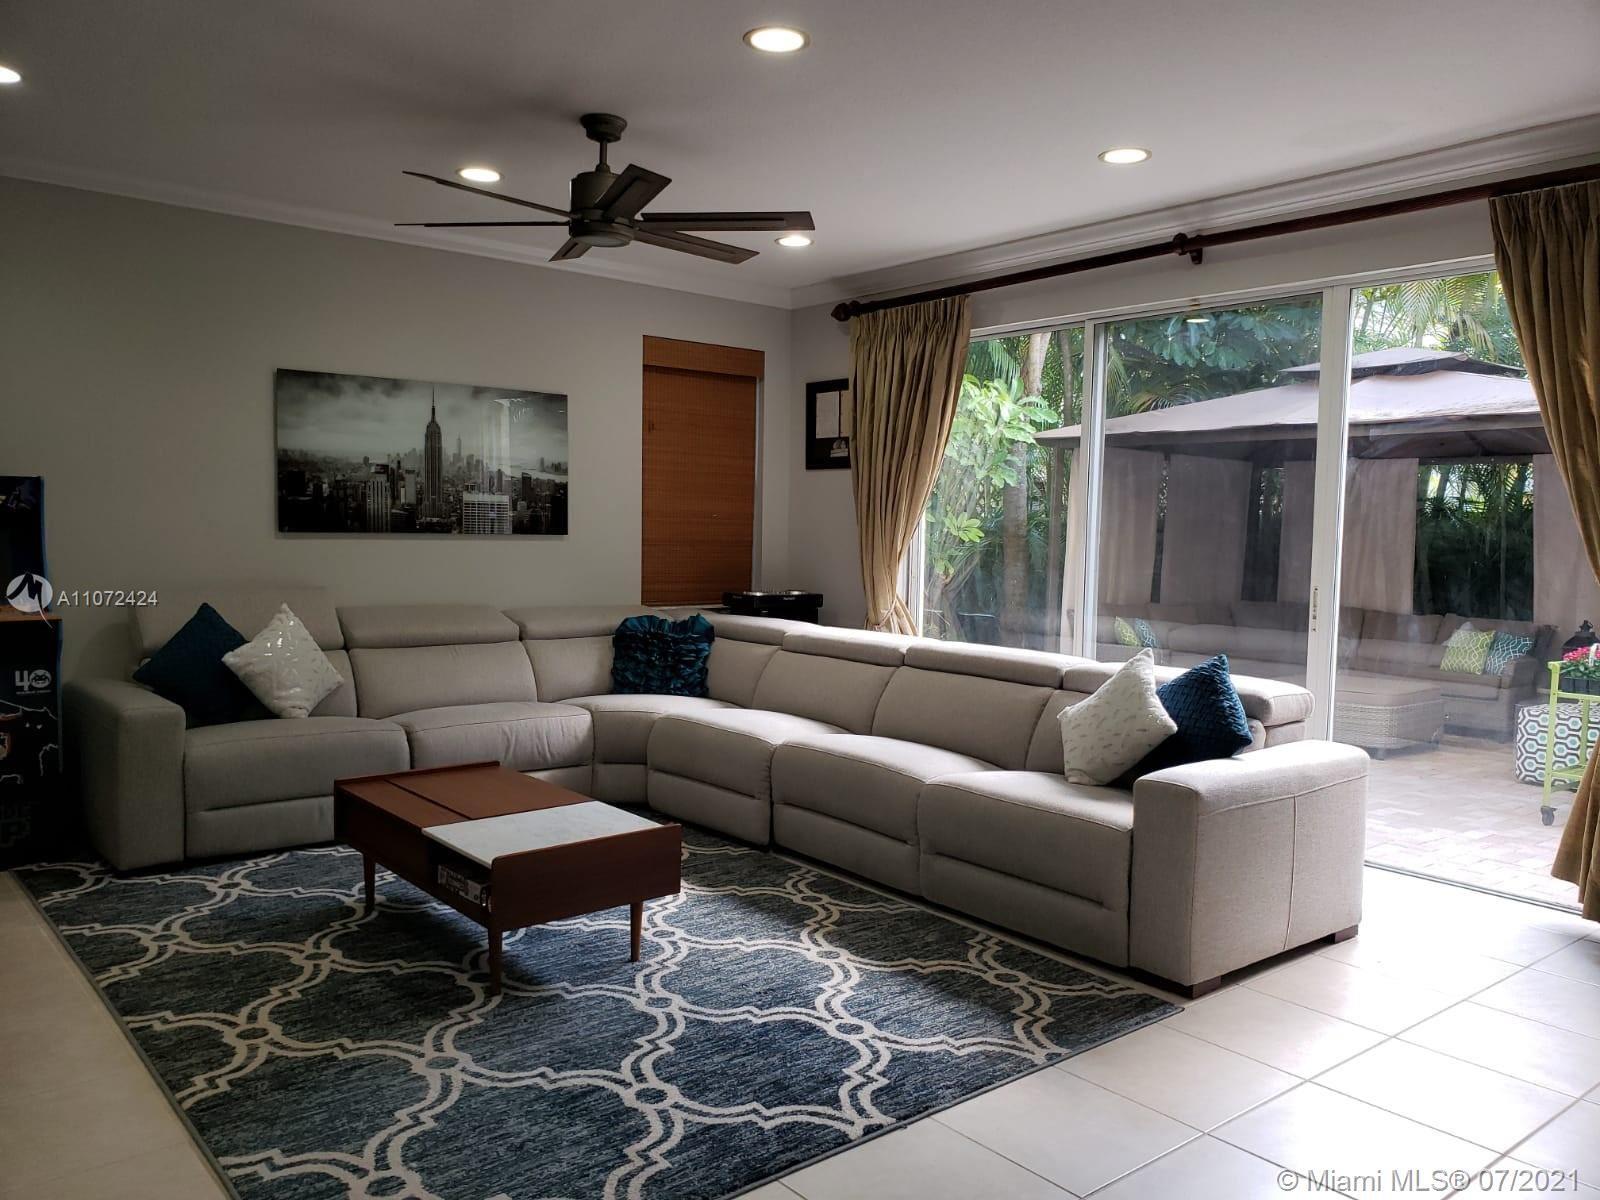 Photo of 5271 SW 159th Ave, Miramar, FL 33027 (MLS # A11072424)